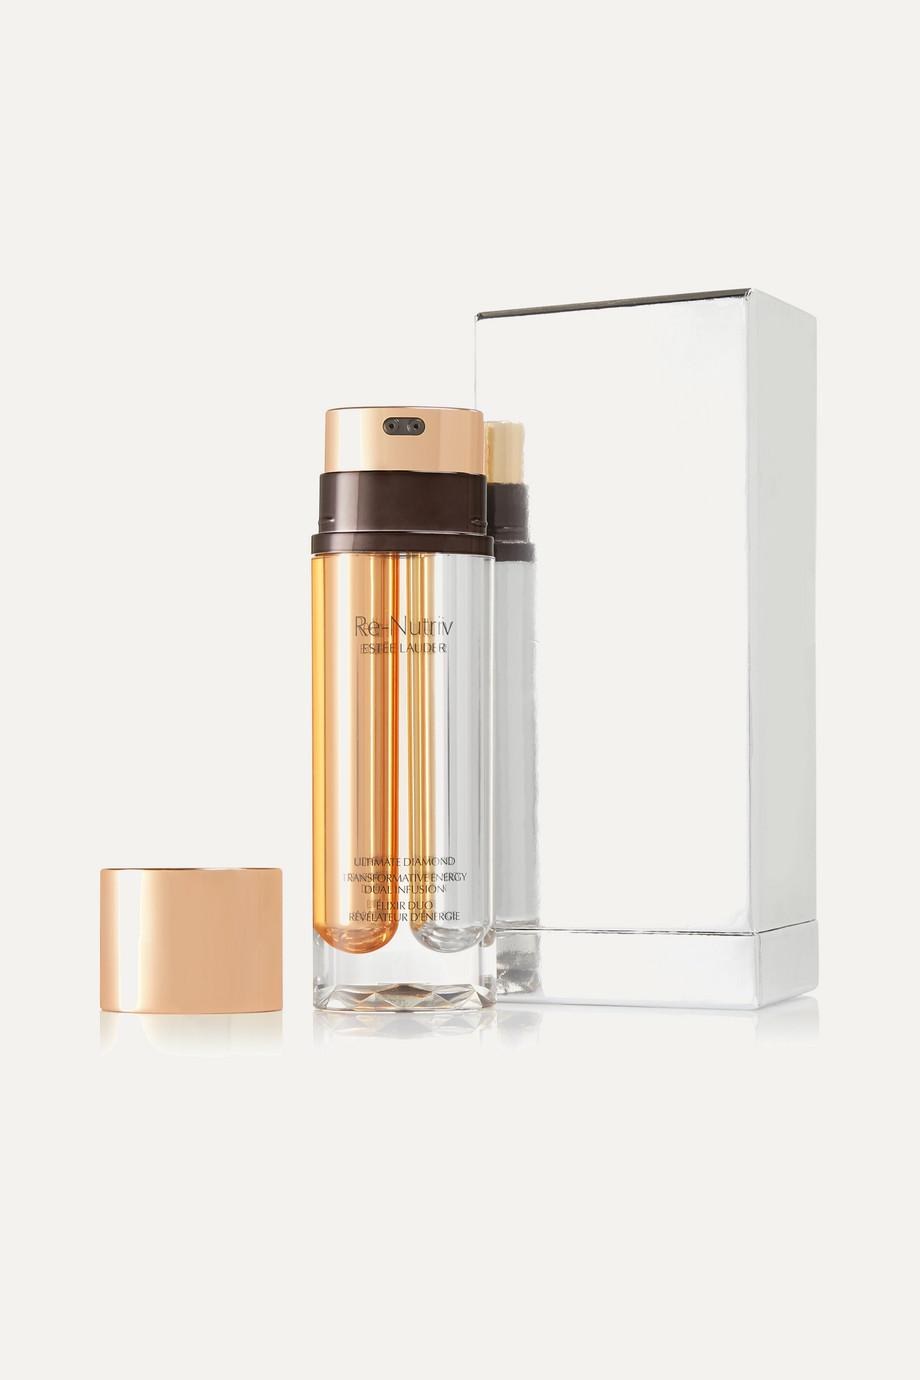 Estée Lauder Re-Nutriv Ultimate Diamond Transformative Energy Dual Infusion Serum, 30 ml – Serum